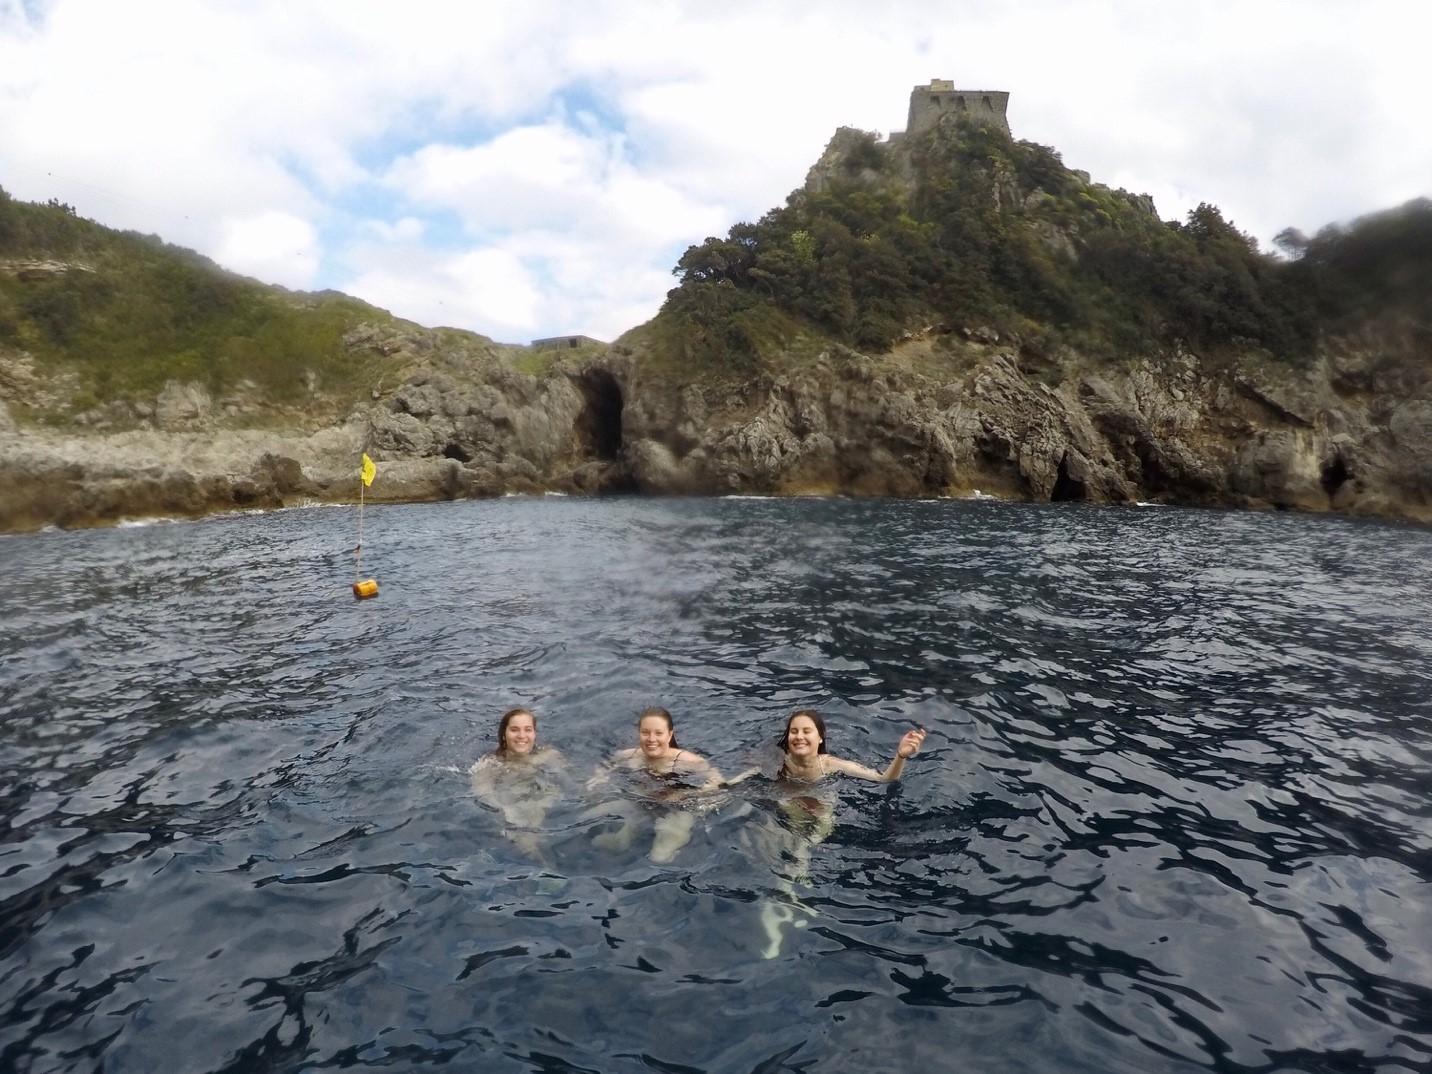 CAPAStudyAbroad_Florence_Spring2017_From Danya Carithers Amalfi Coast 3.jpg